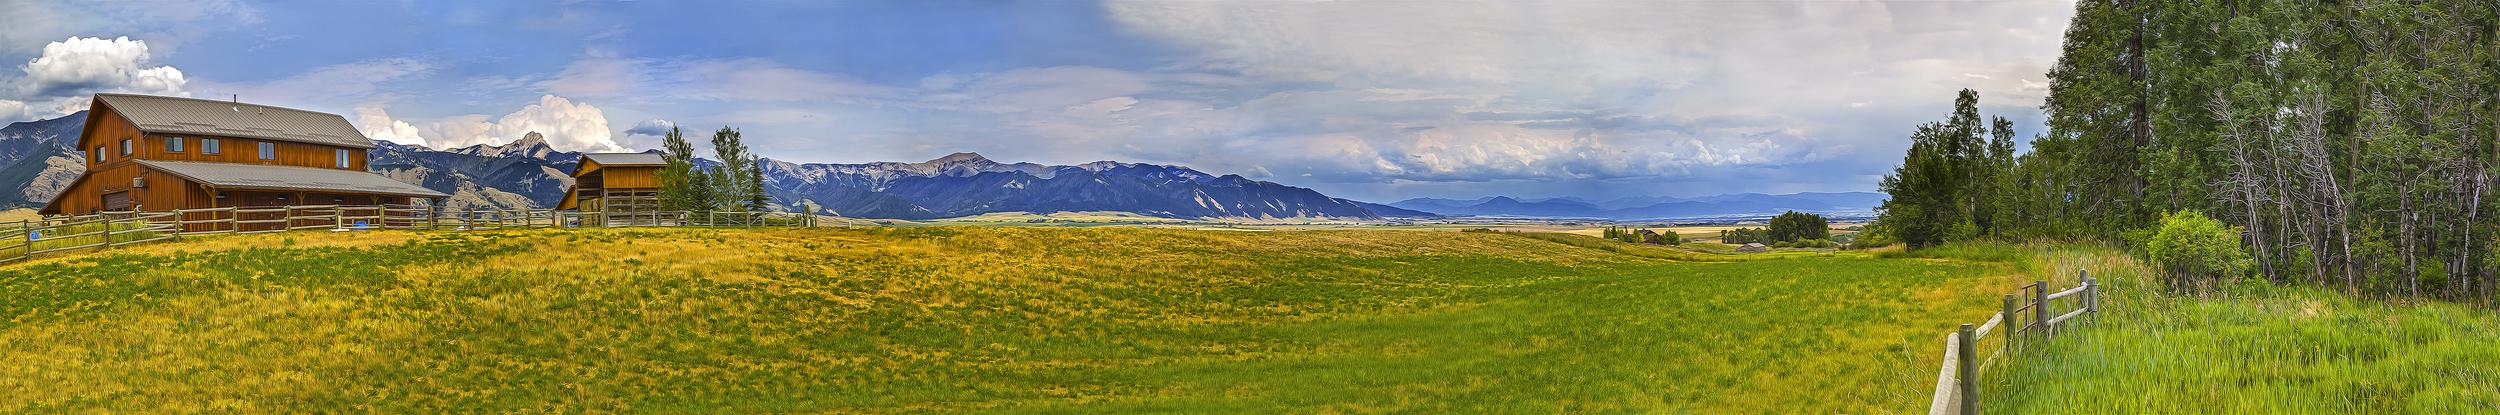 Ranch near Bozeman Montana